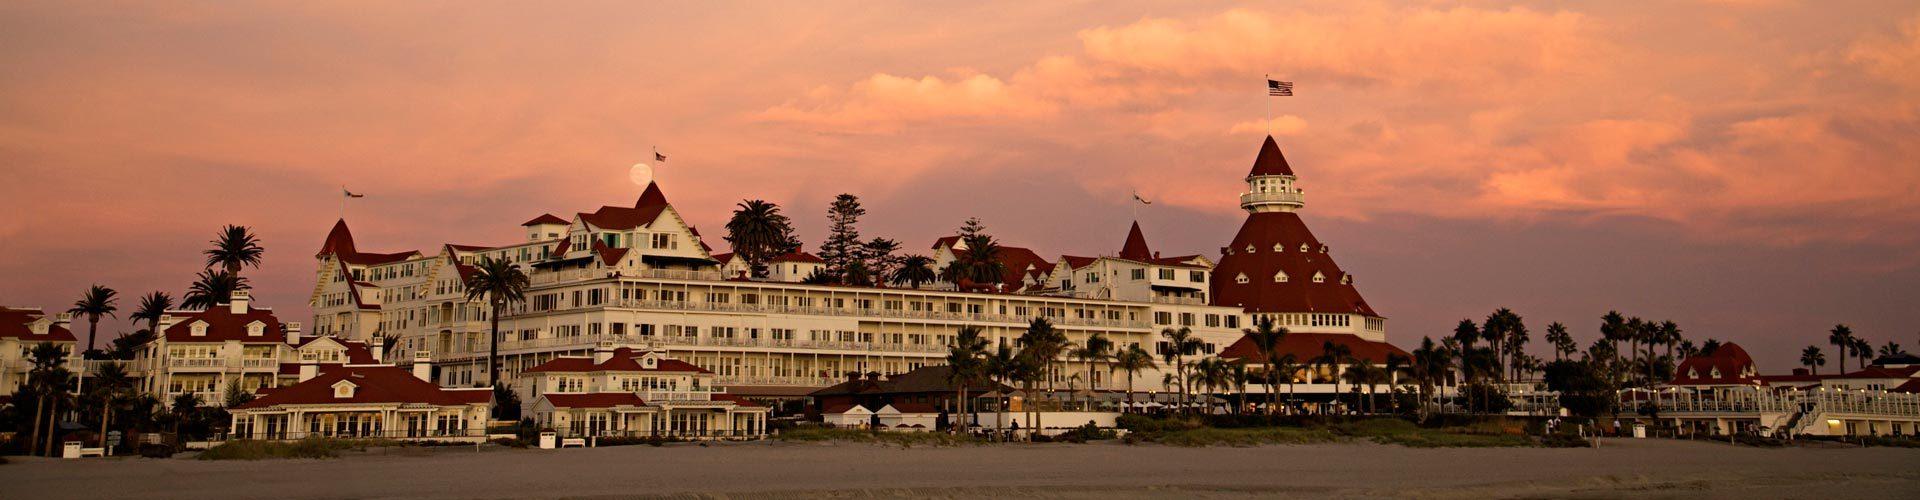 Coronado Hotel, San Diego, Kalifornien